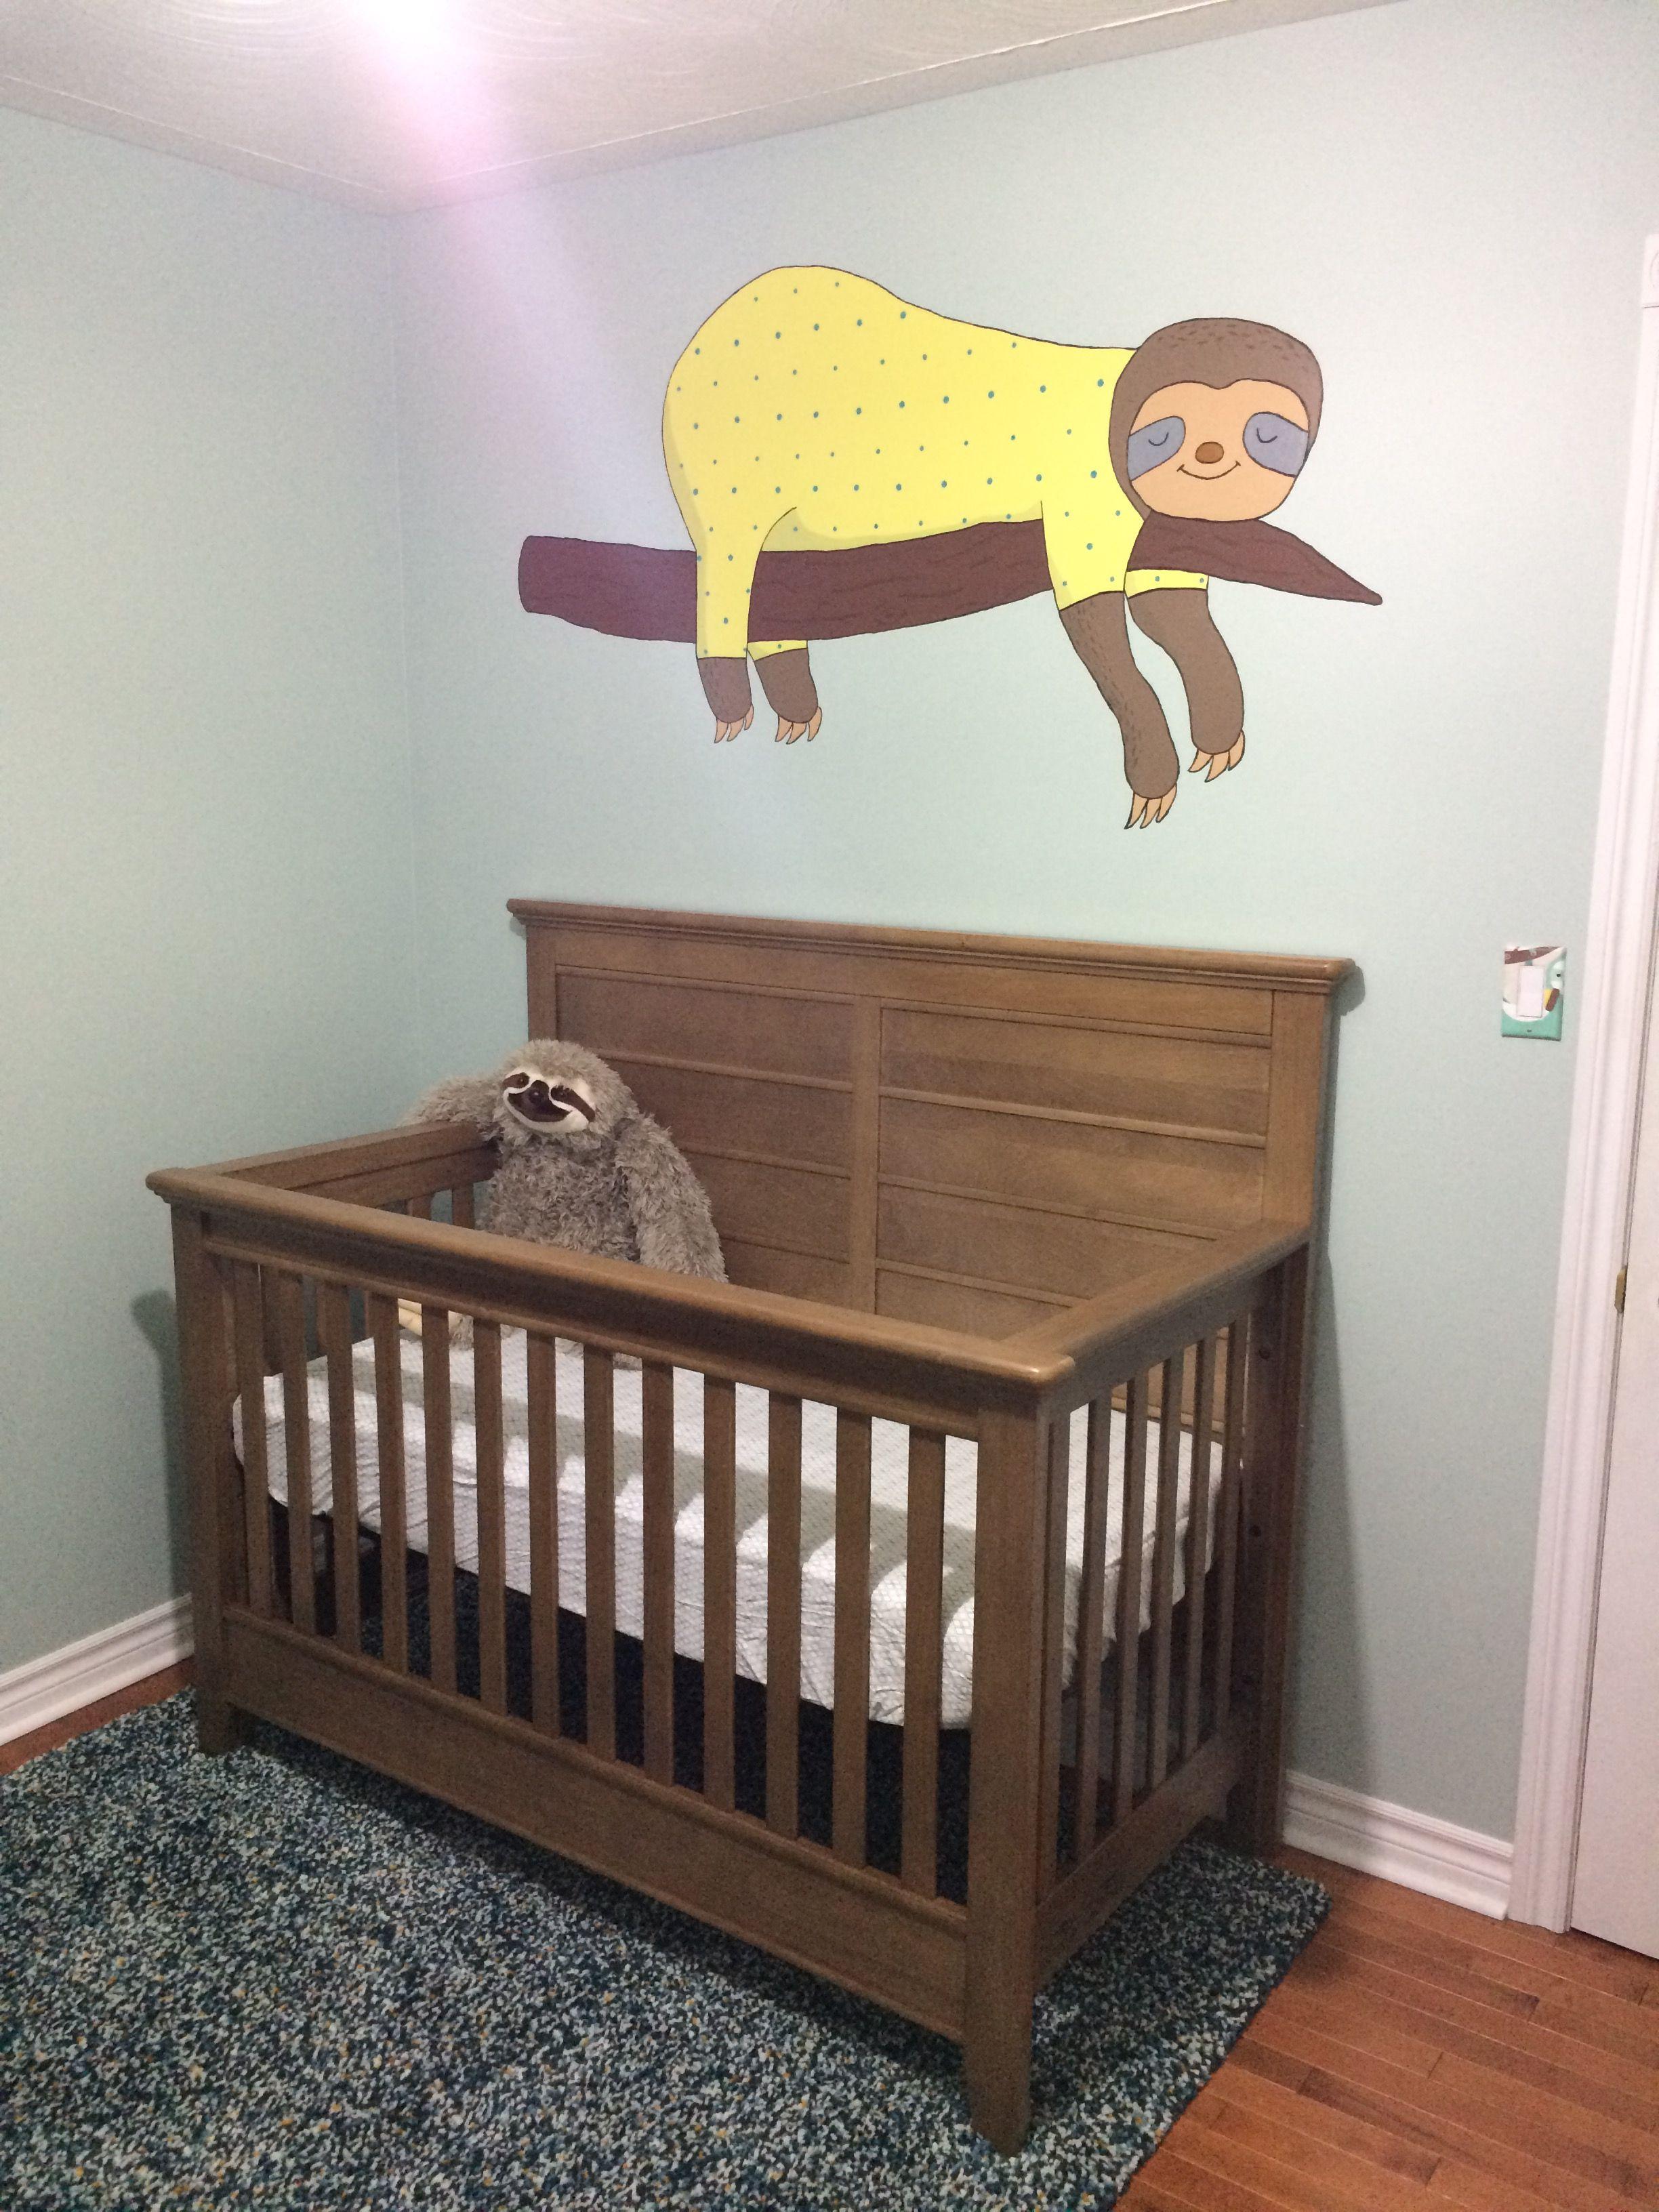 Sloth Mural Nursery | Nursery mural, Home projects, Baby room